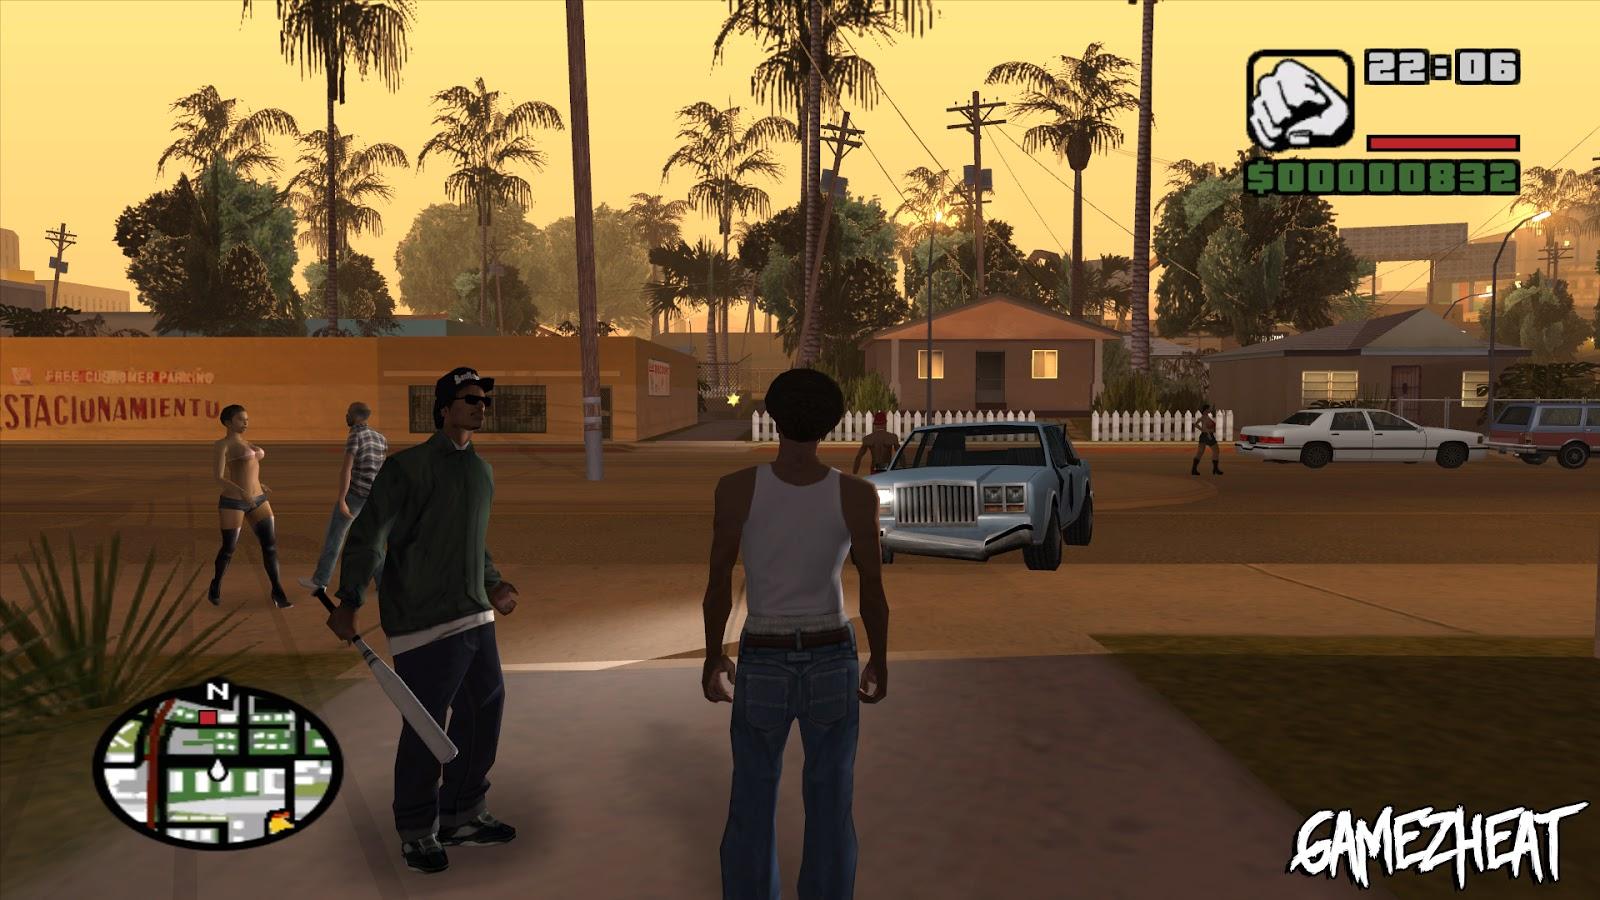 GTA San Andreas PC Game Free Download |